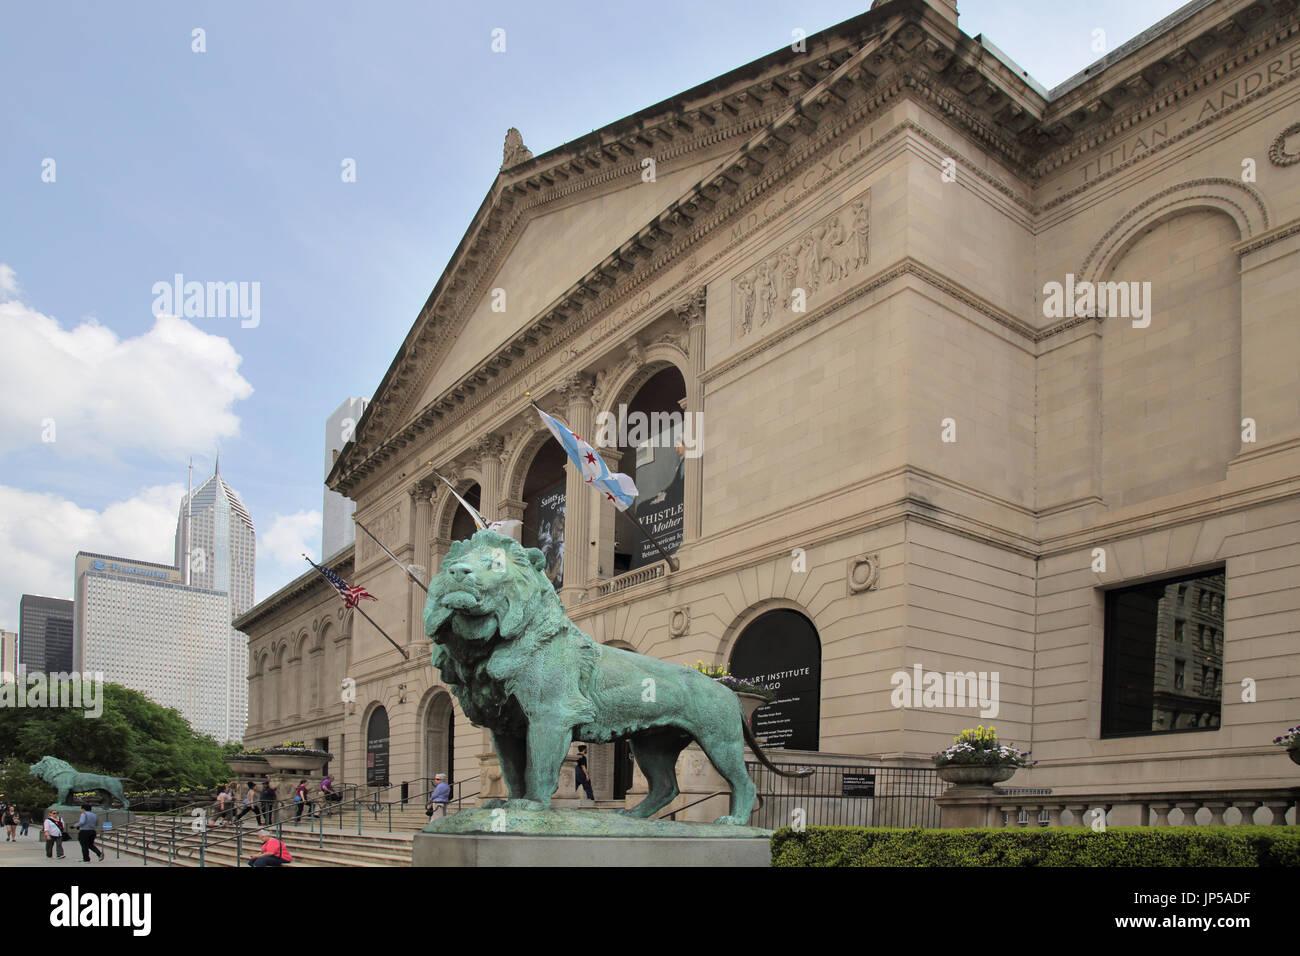 tha art institute of chicago in chicago Illinois Stock Photo